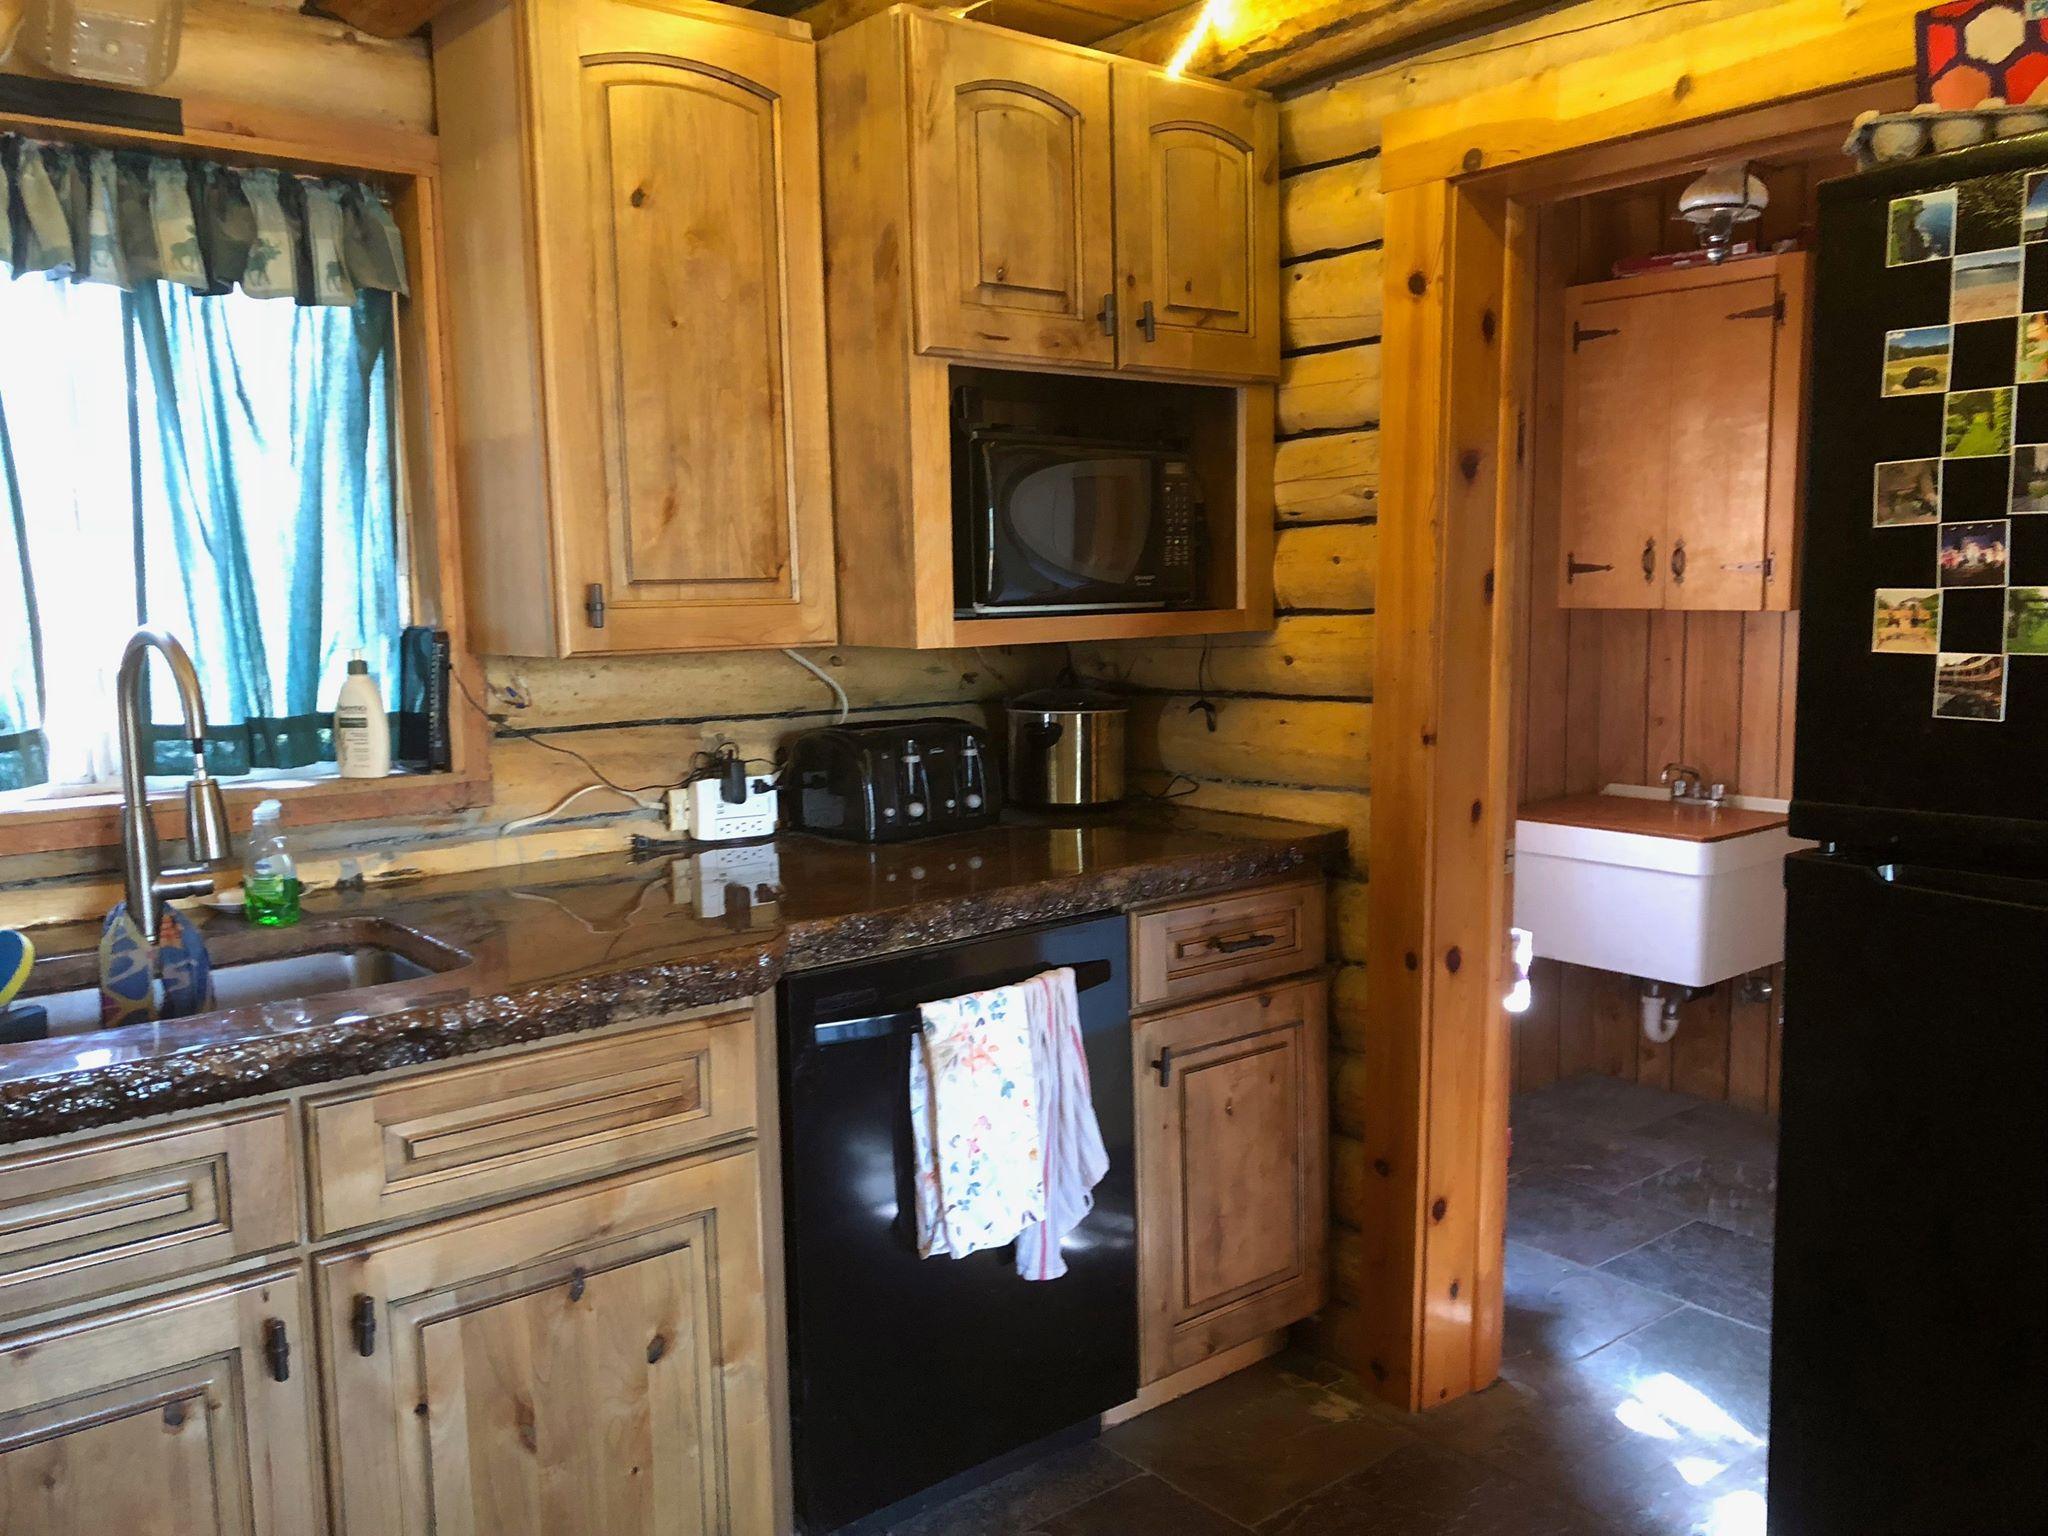 cabin-rental-island-park-idaho-yellowstone-.jpg